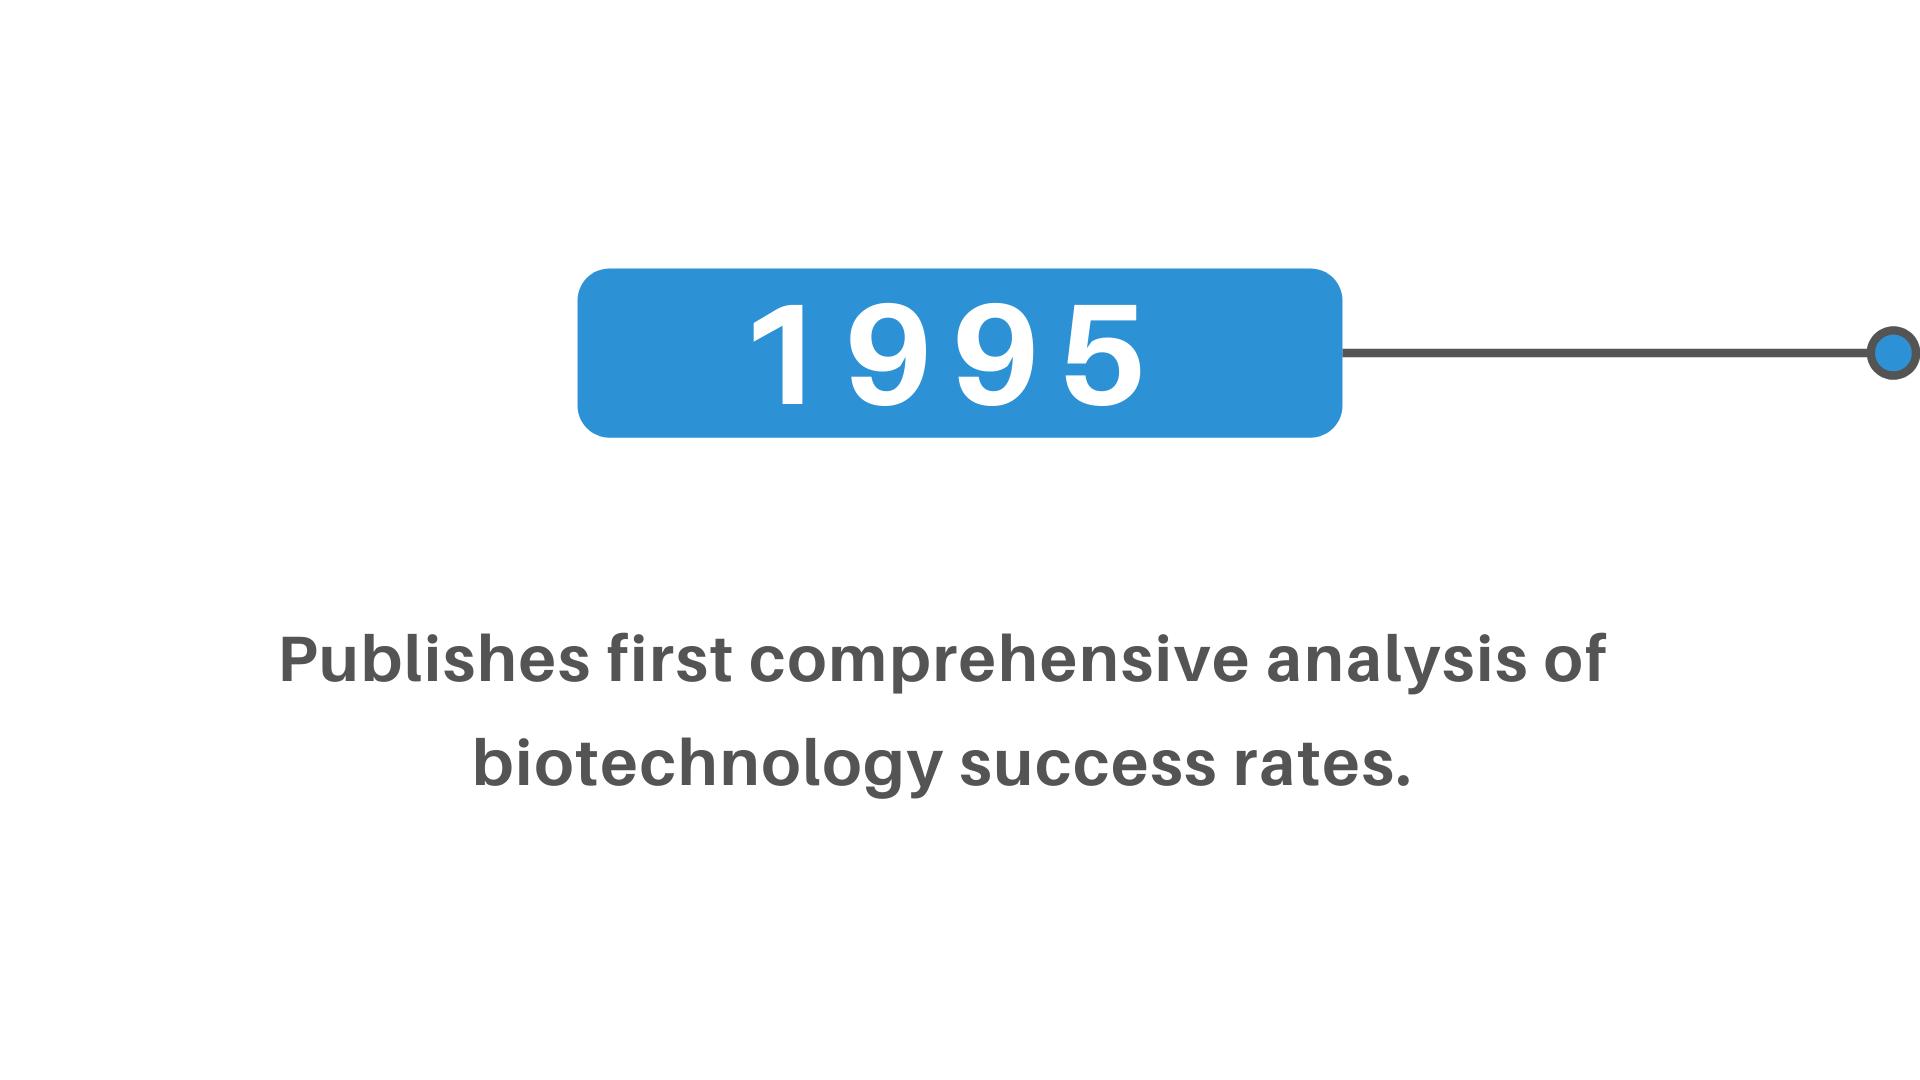 biotechnology success rates